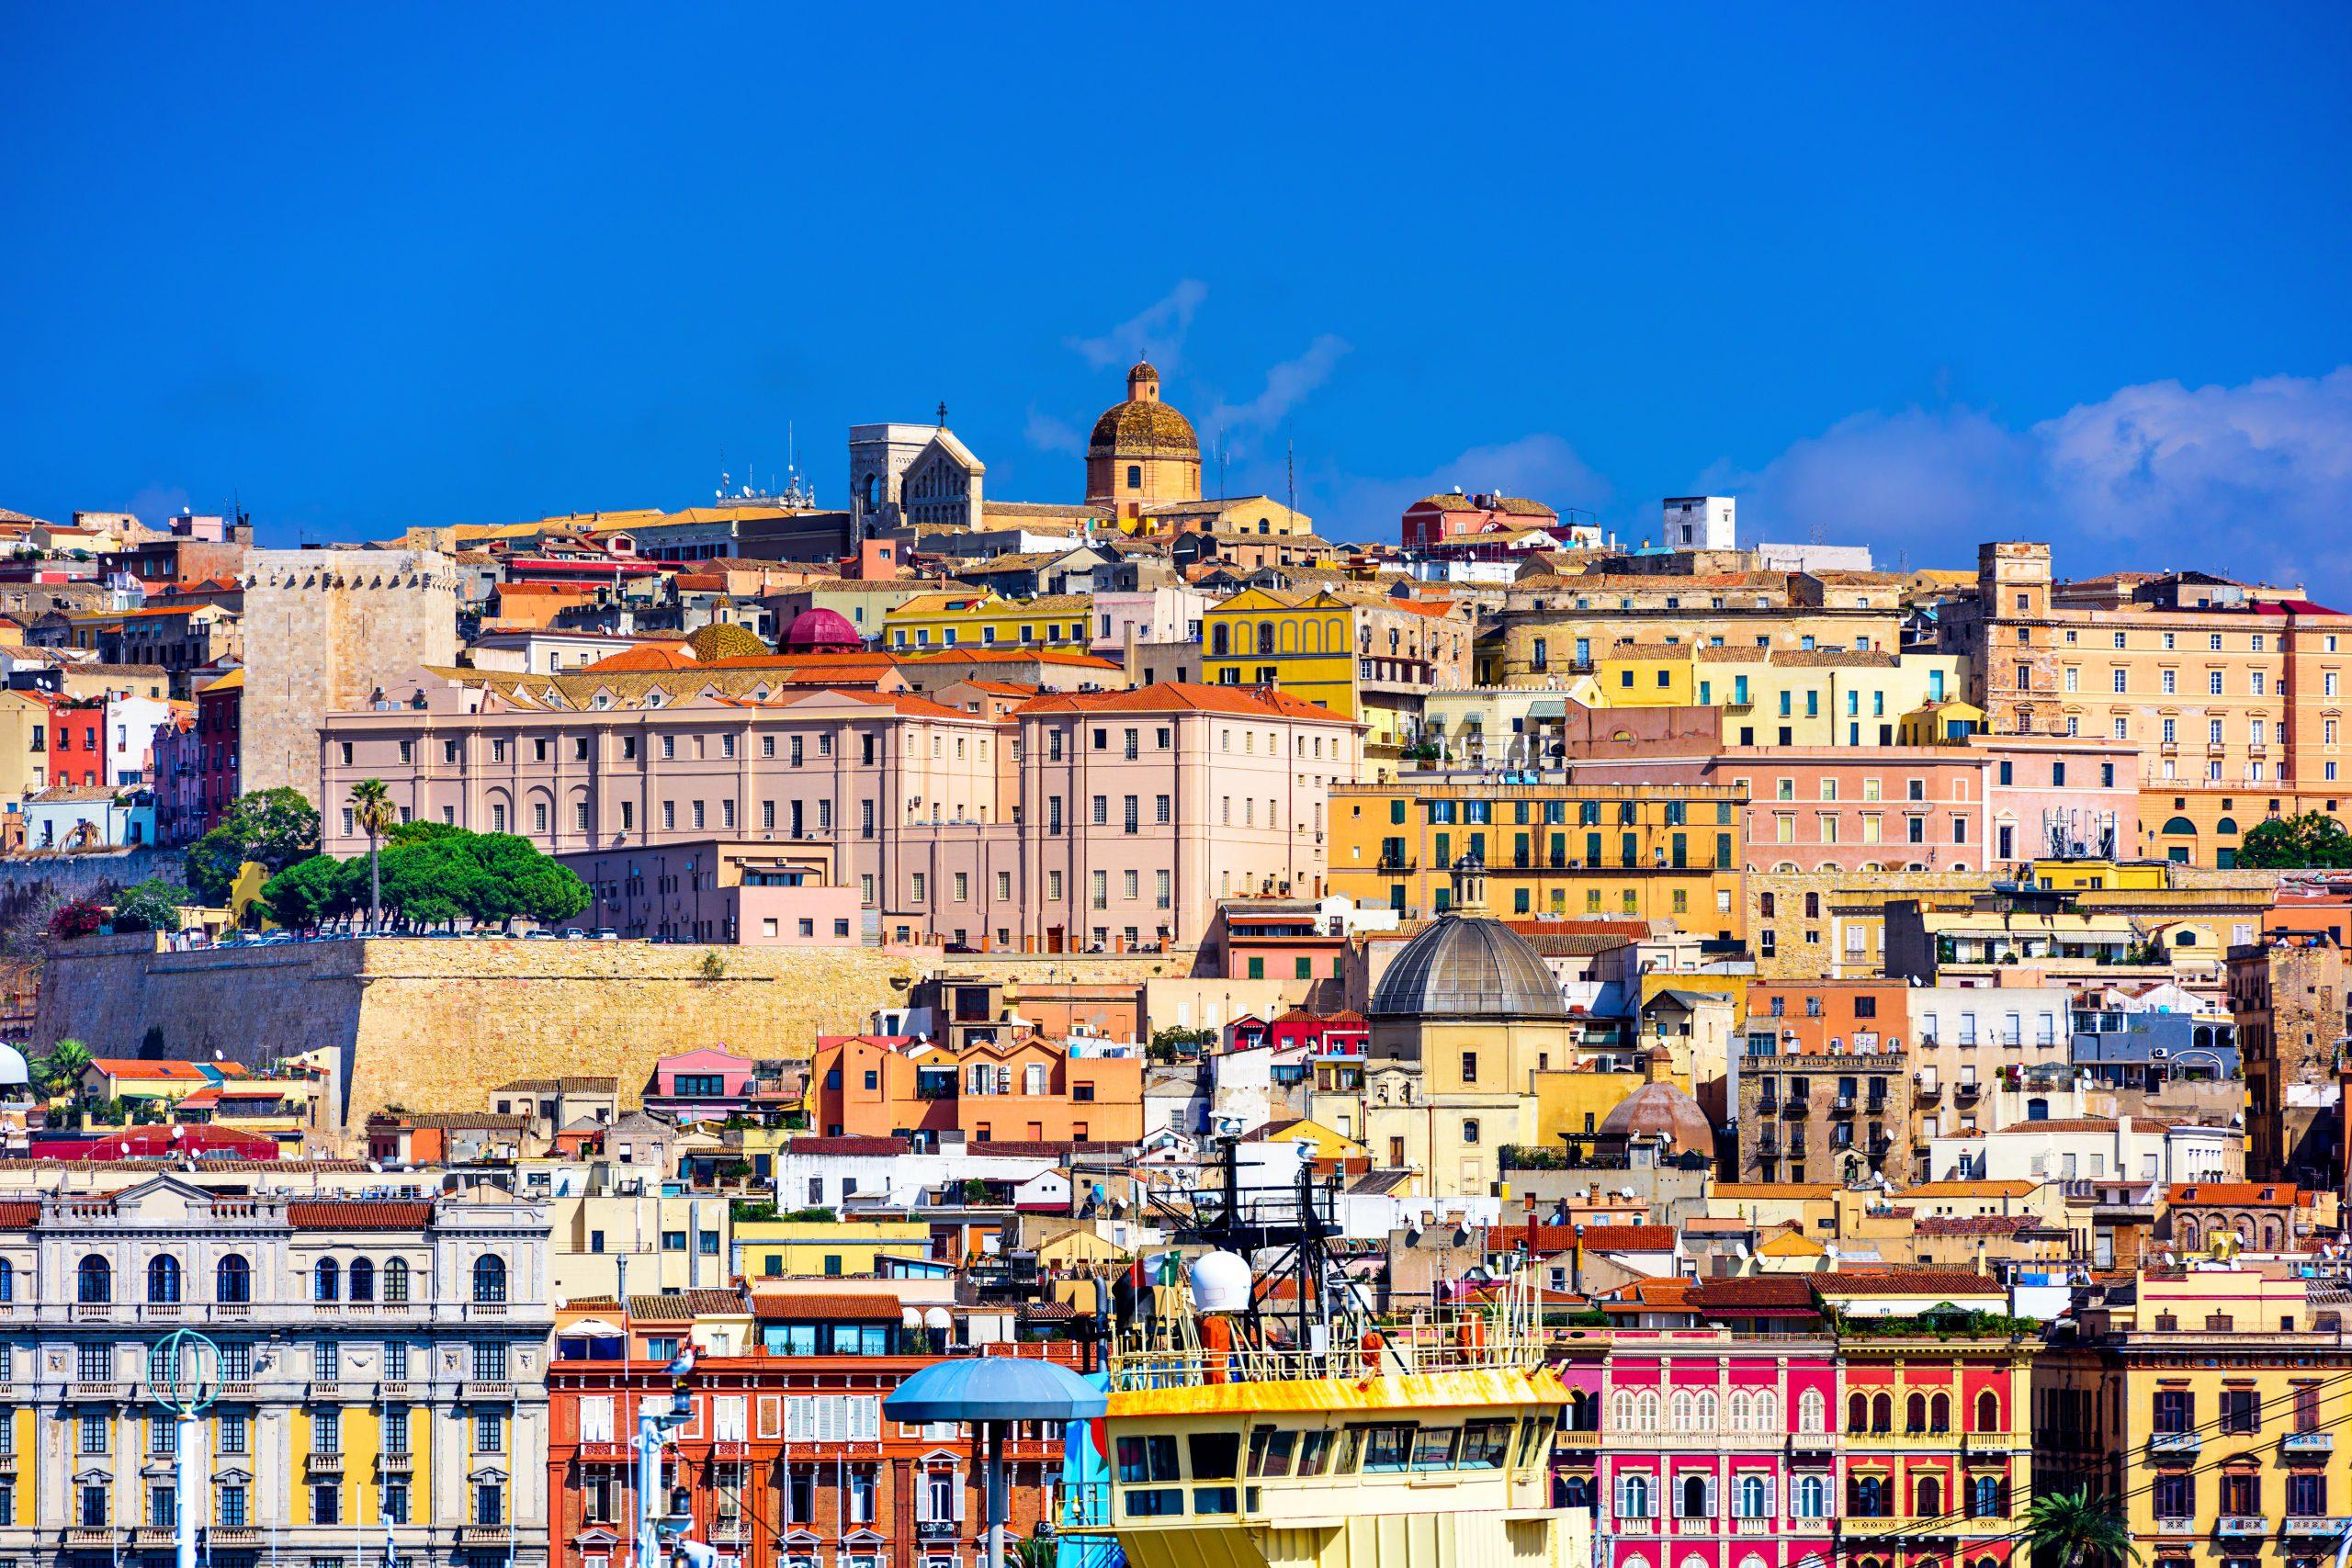 Cagliari, Sardynia, licencja: shutterstock/By Sean Pavone